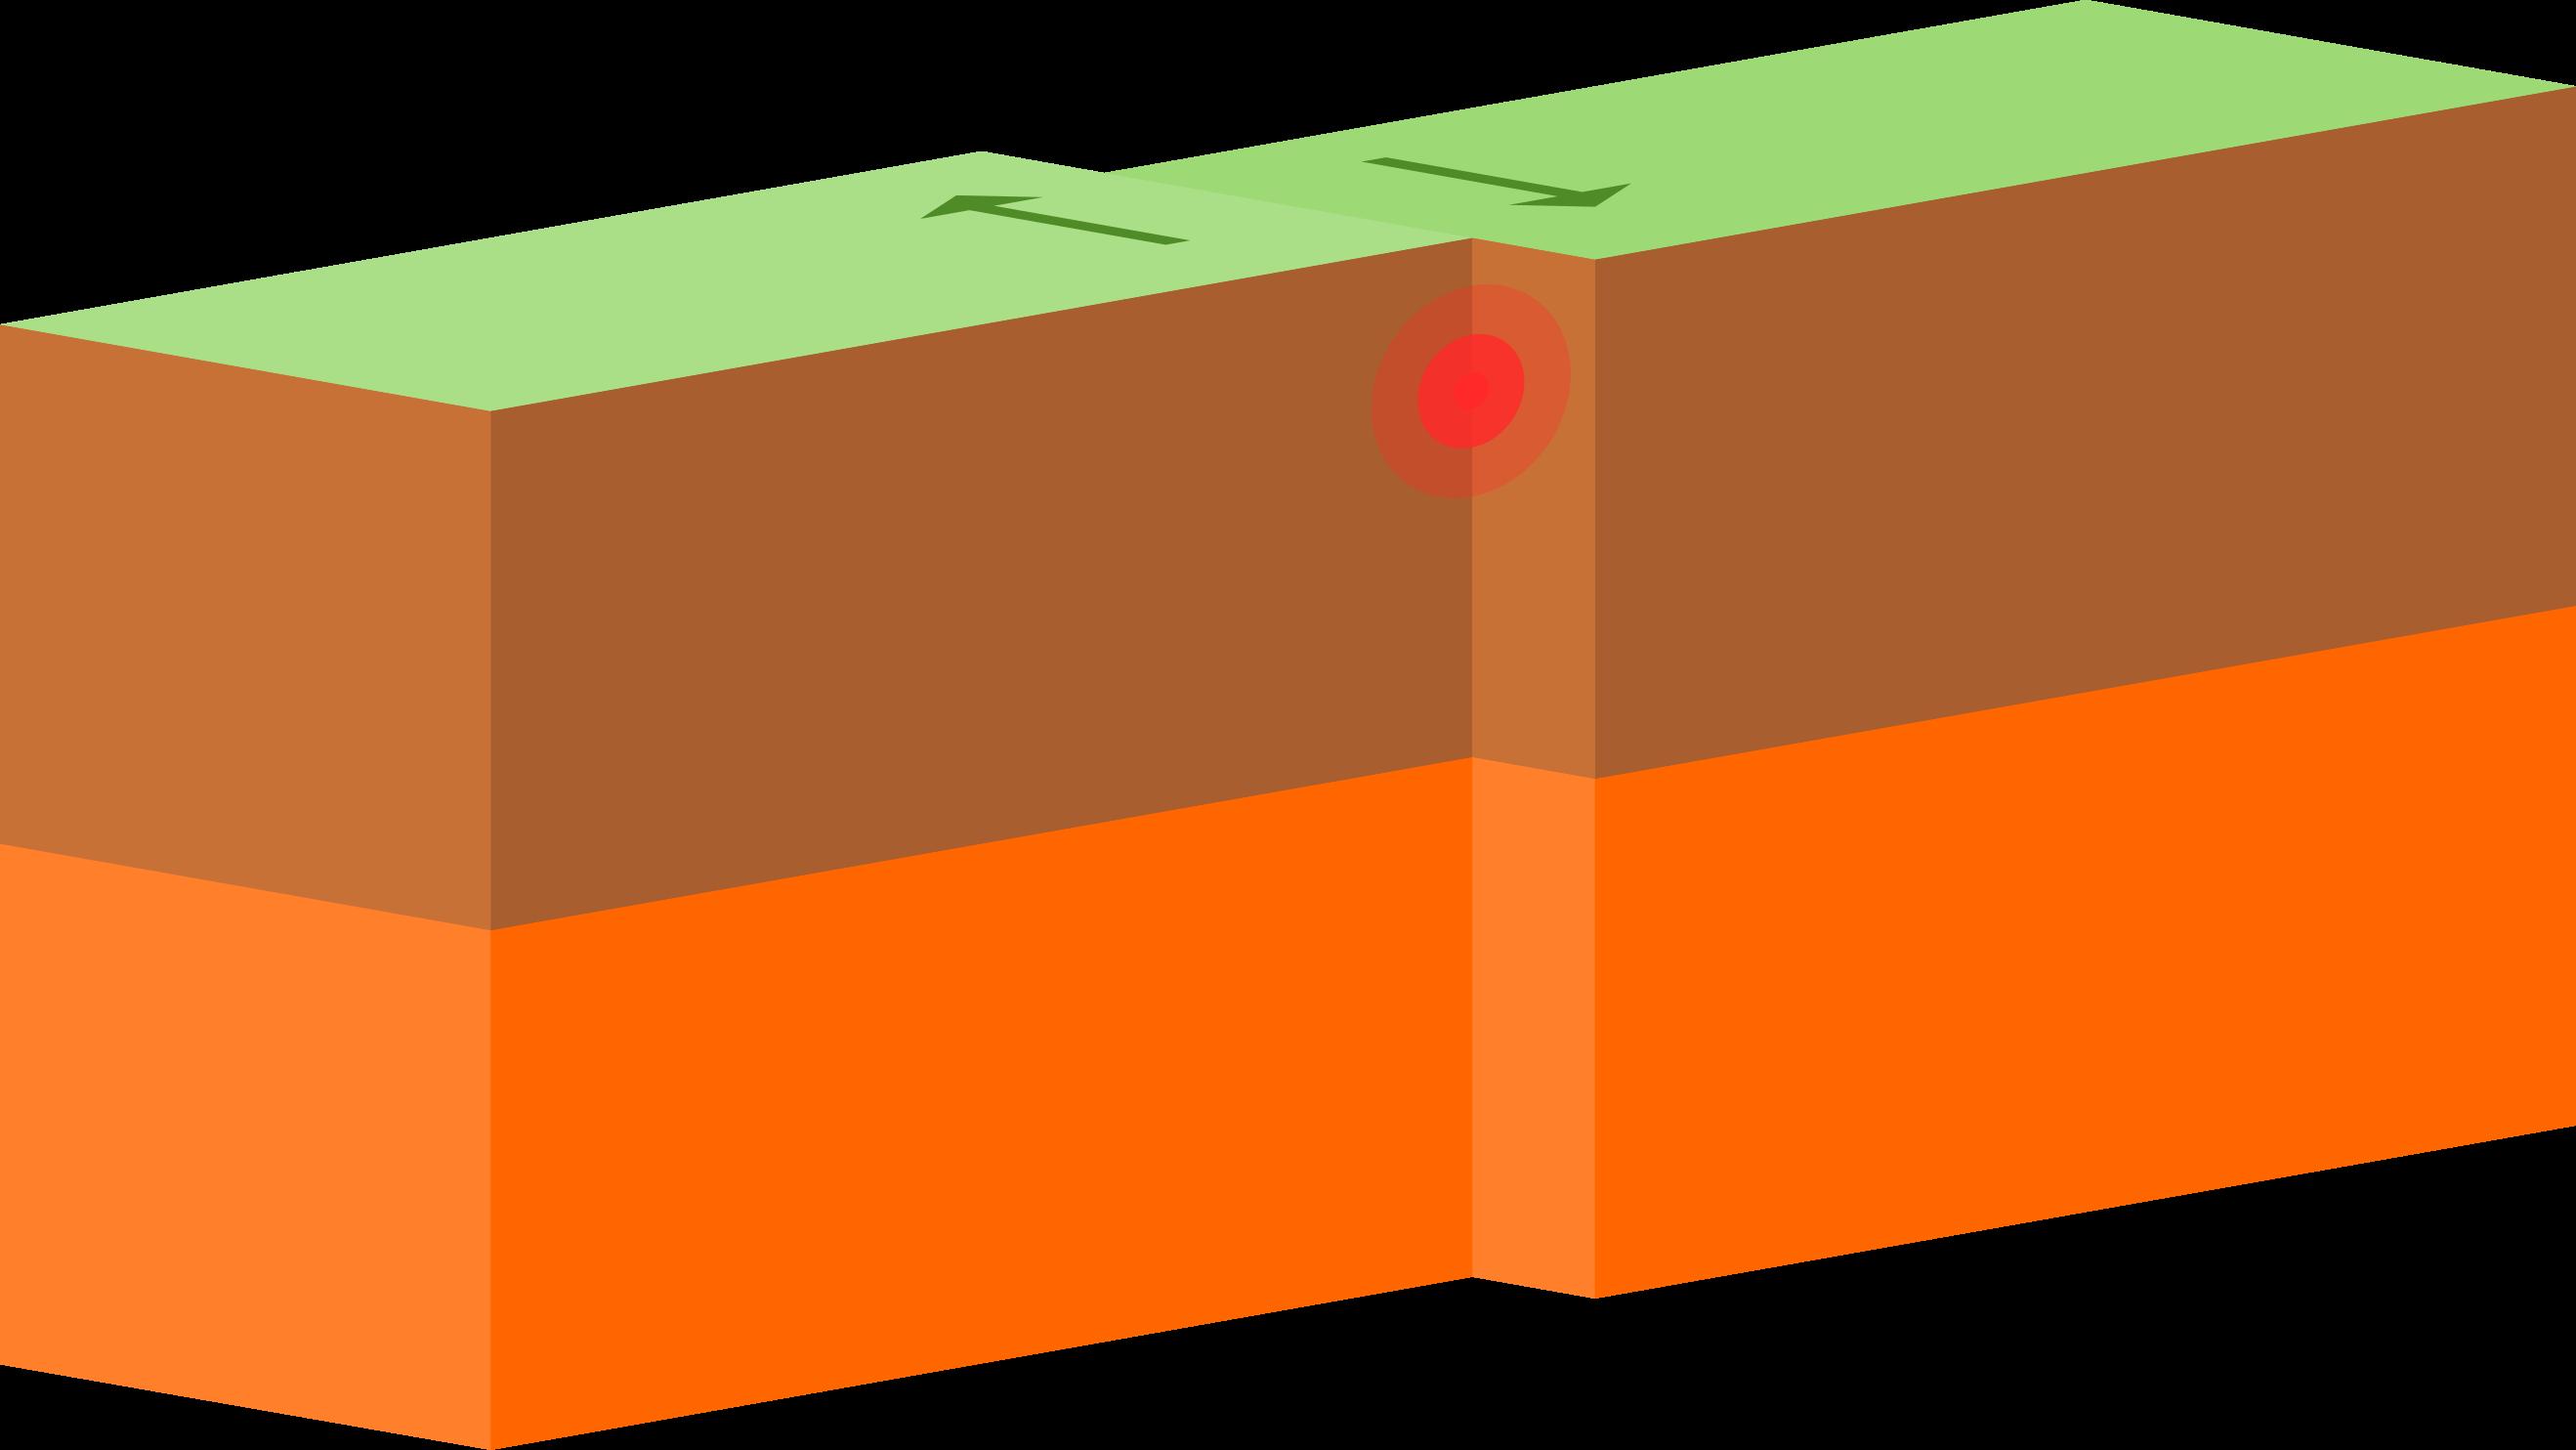 Earthquake clipart tectonic earthquake. File continental conservative plate